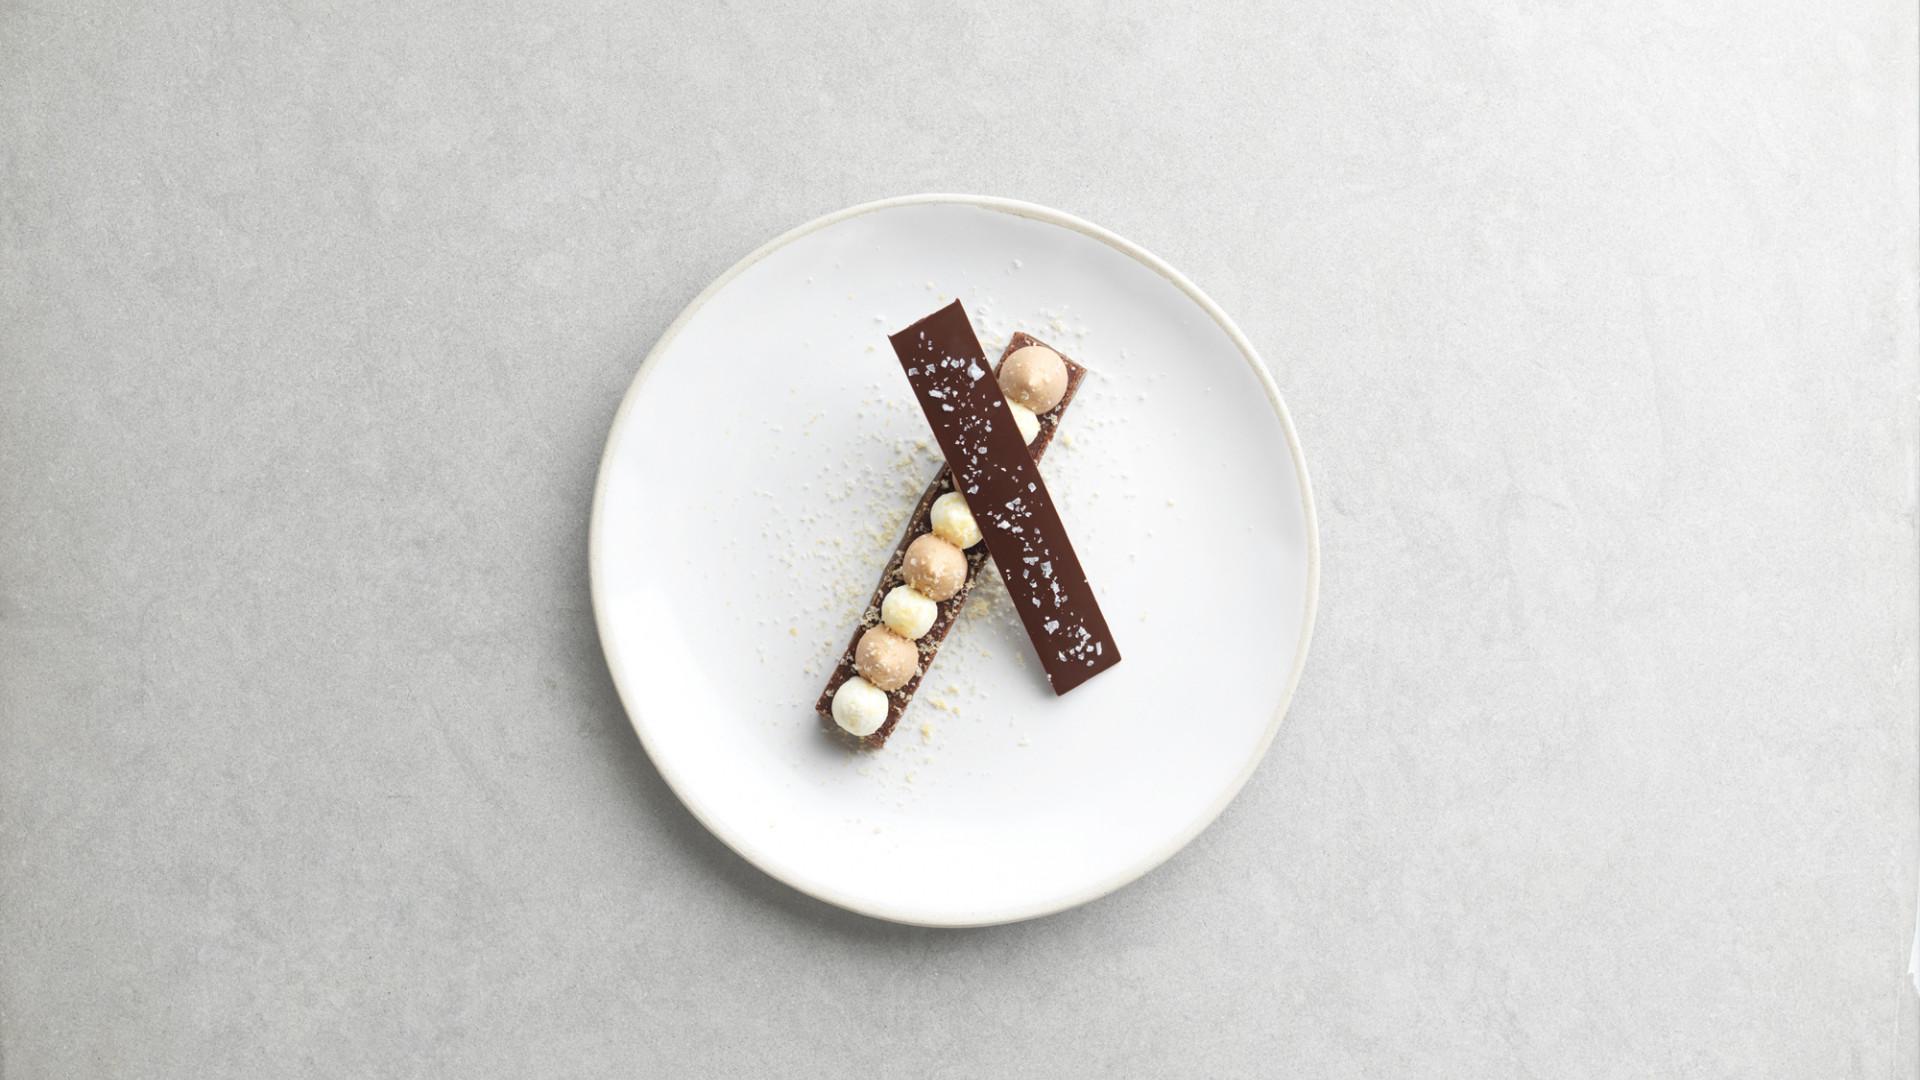 Chocolate nougatine at Marcus